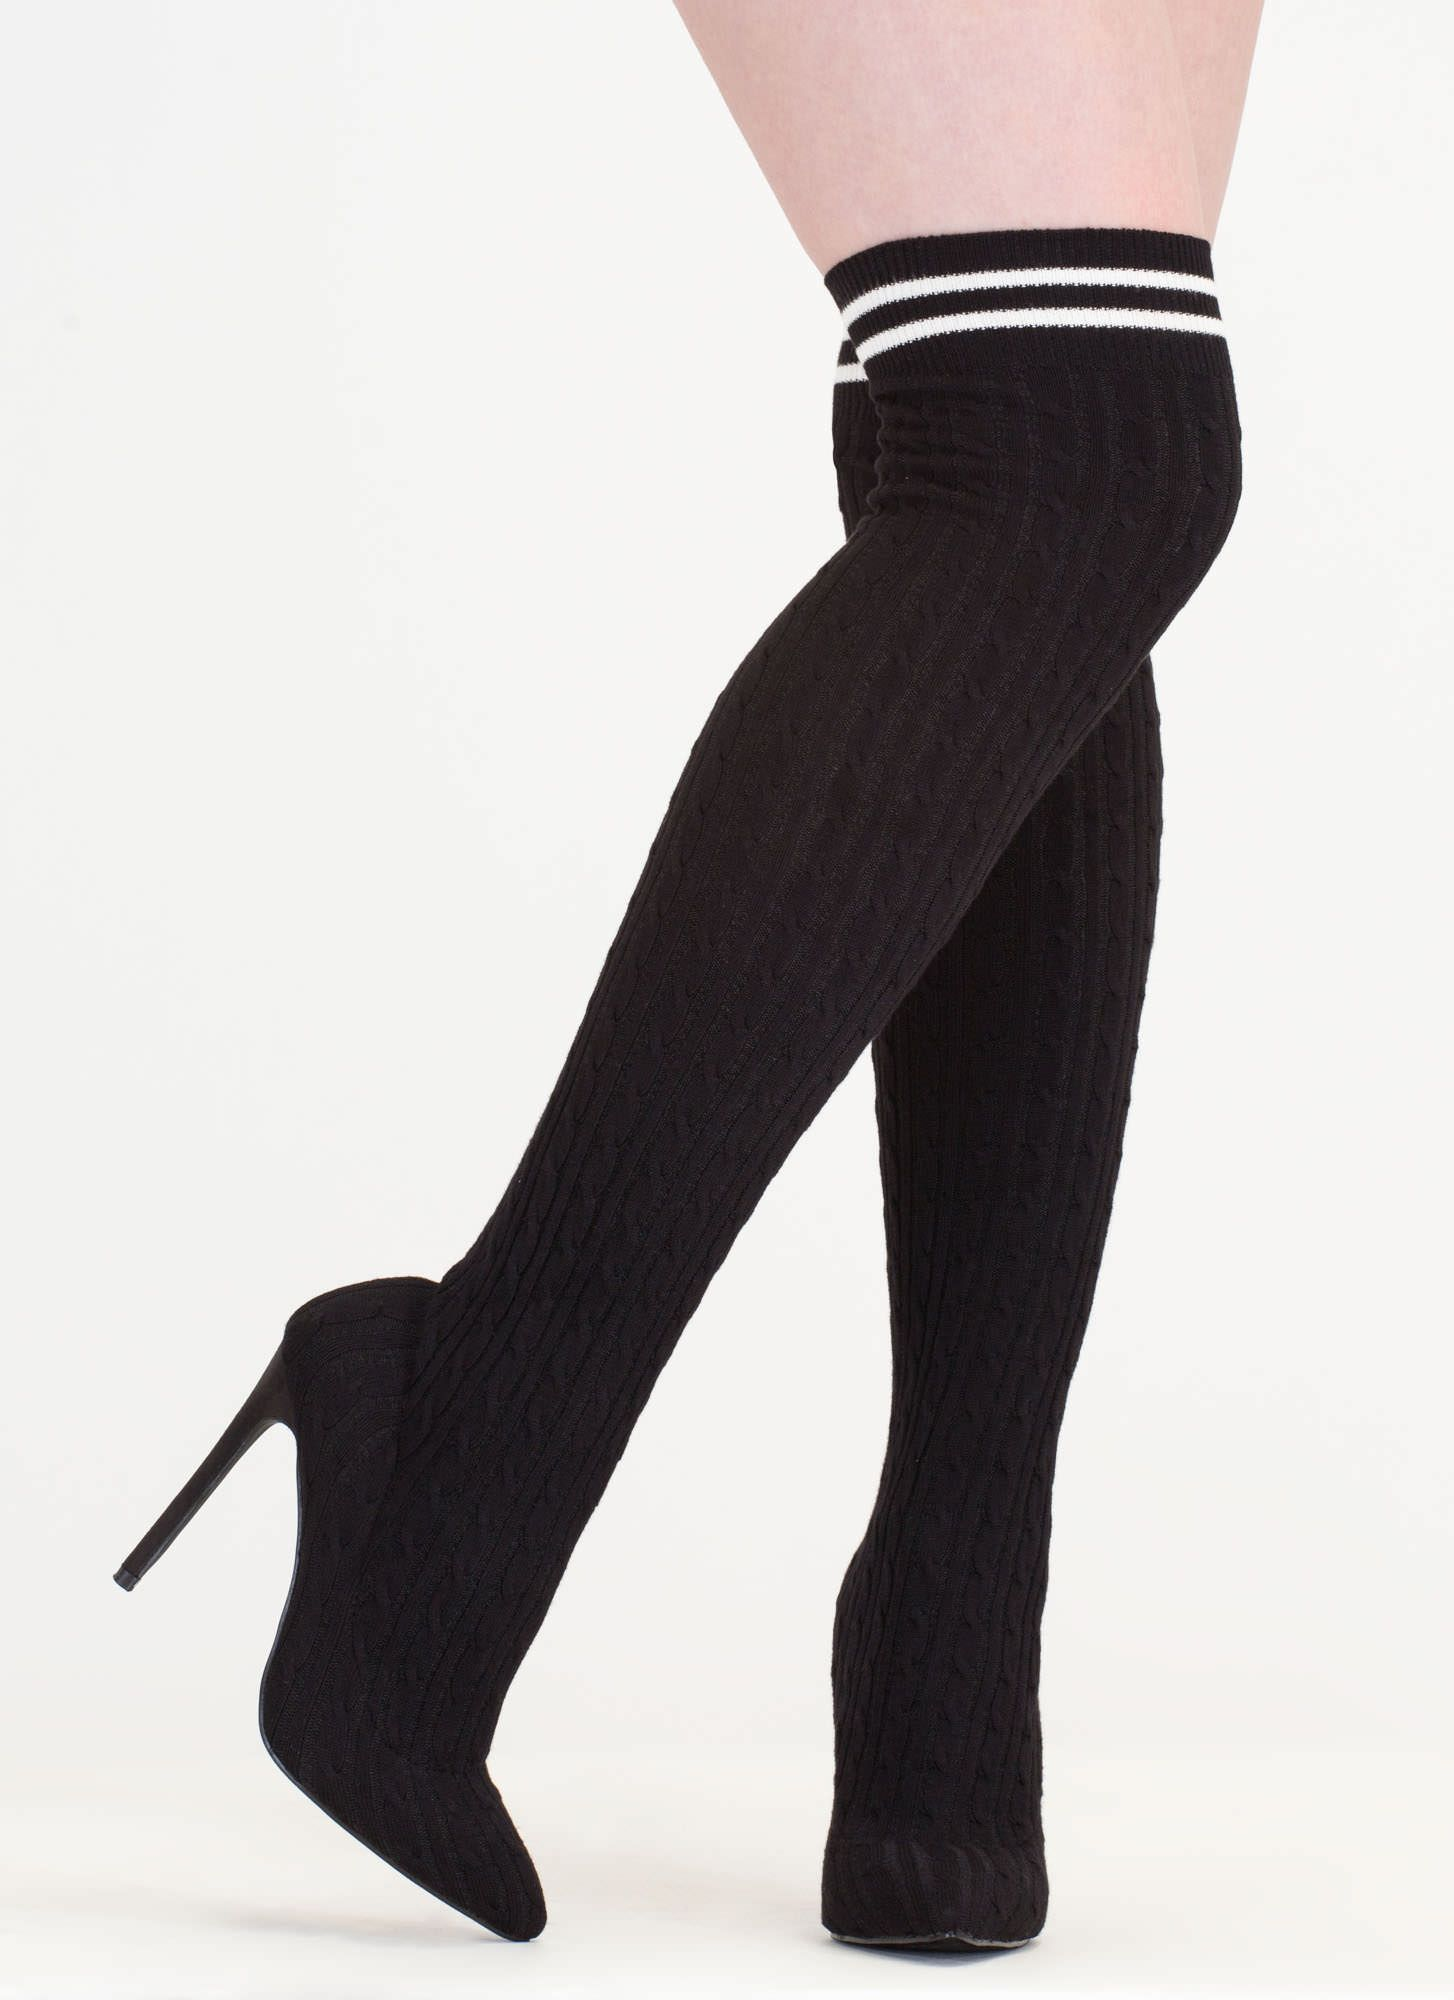 Thigh high sock boots, Thigh highs